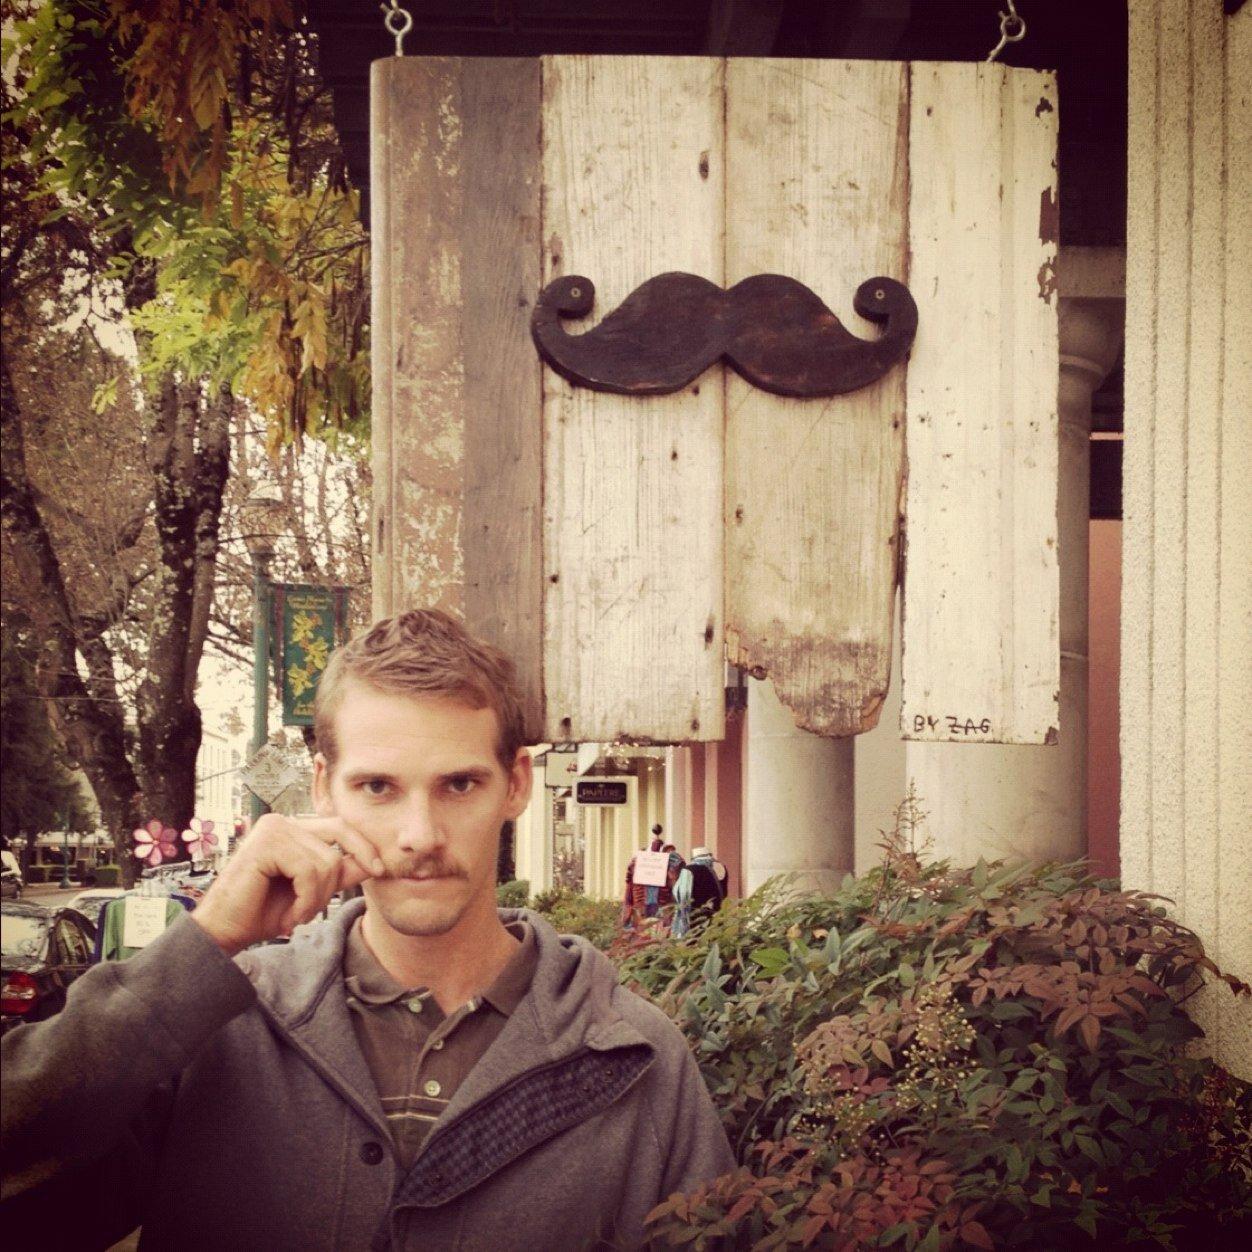 nils mustache